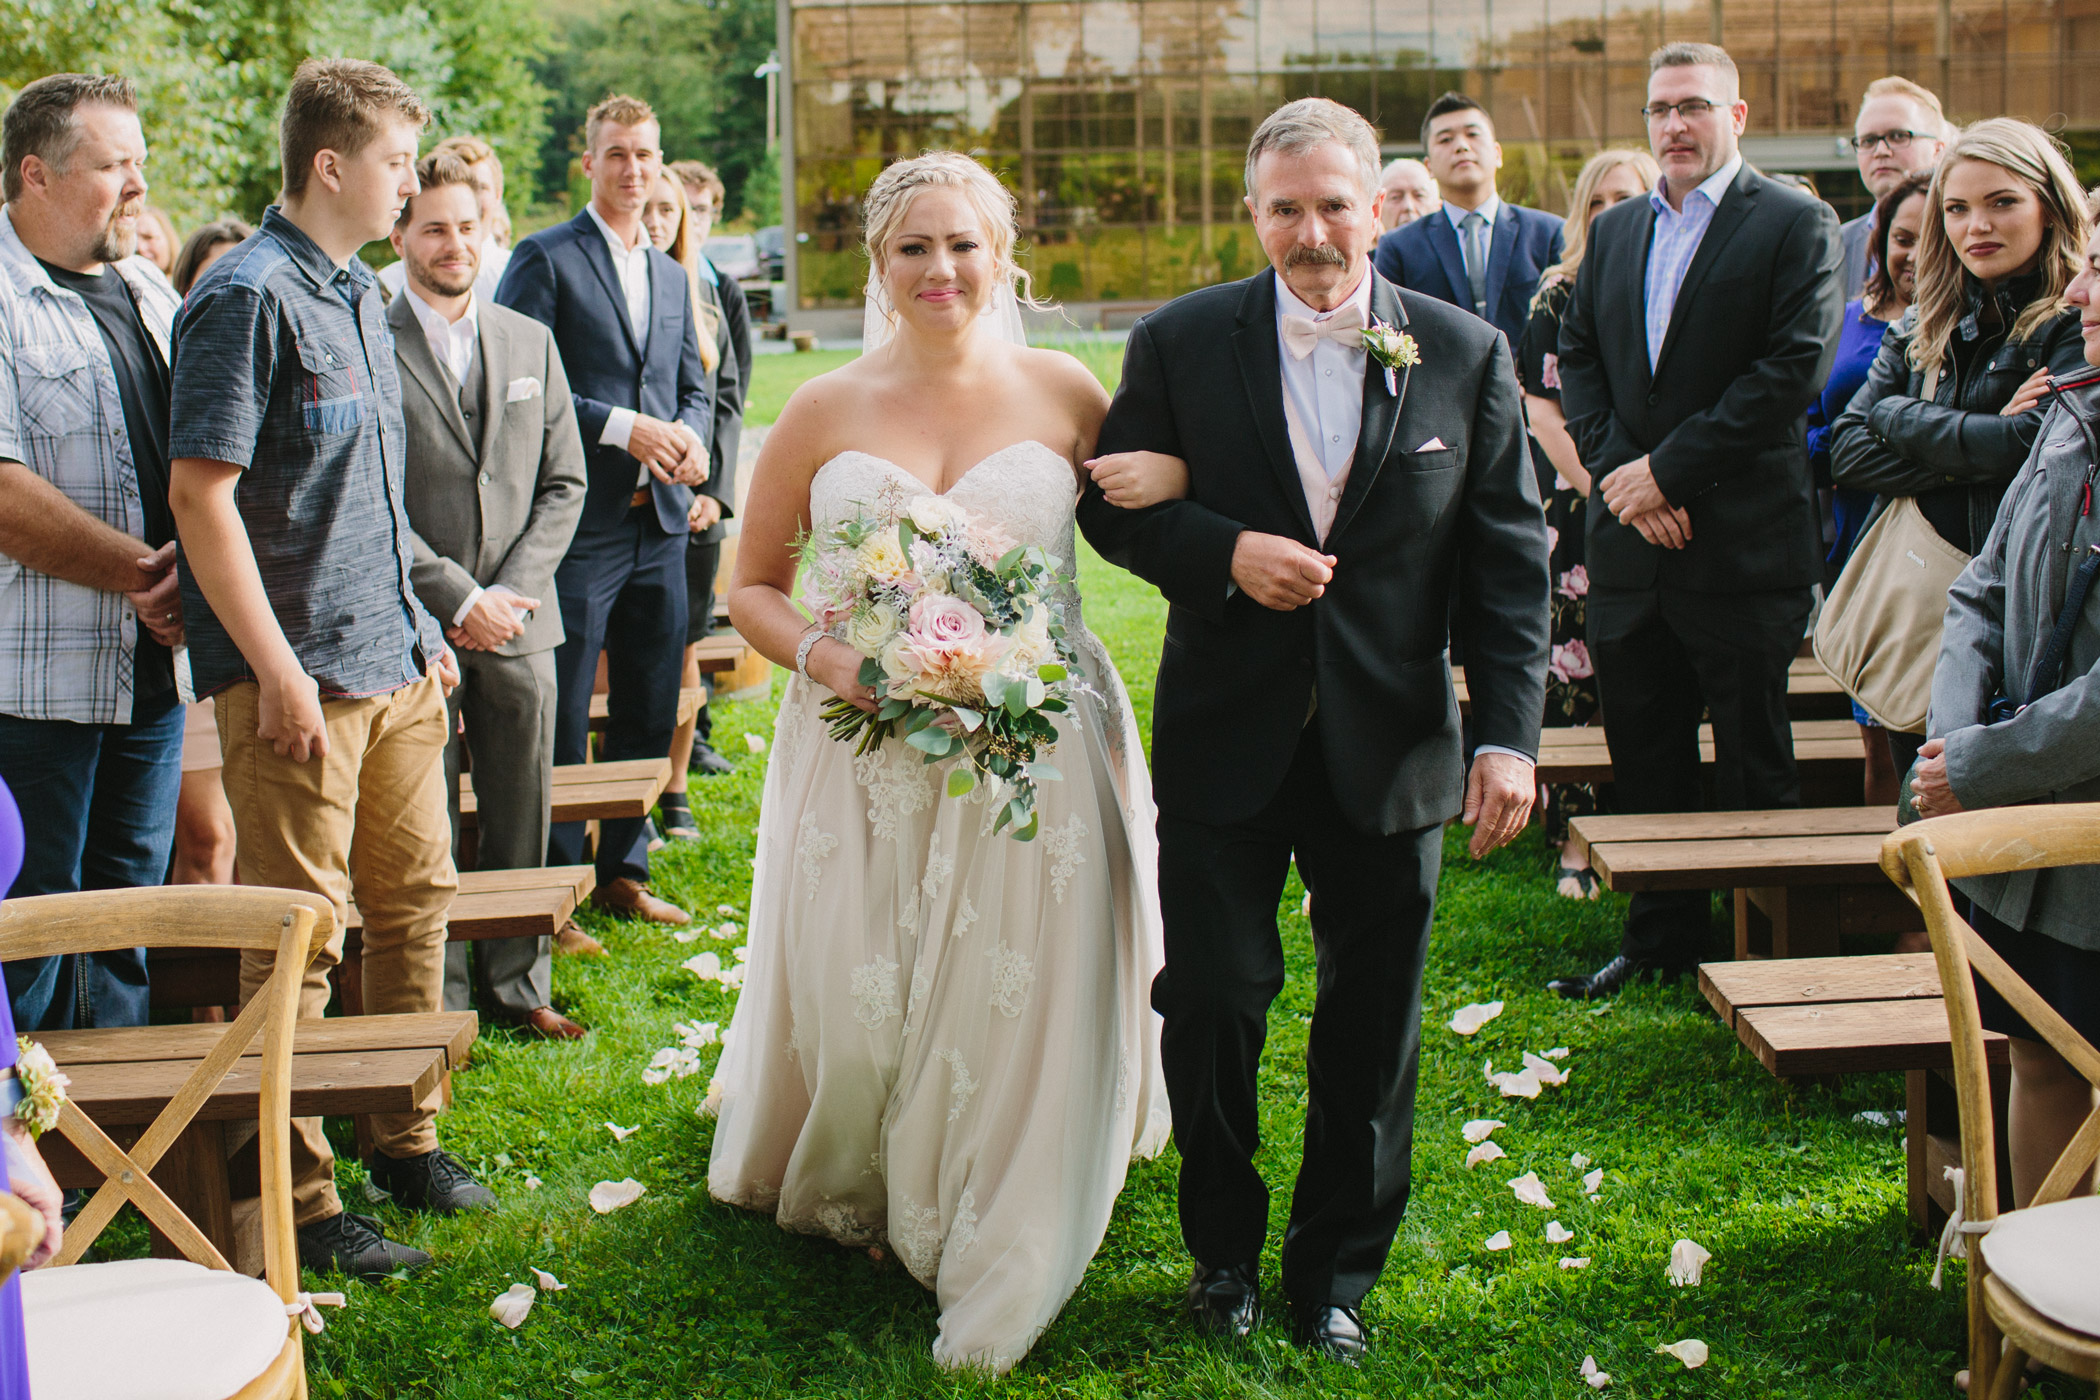 Wedding Ceremony at Glasshouse Estate Winery